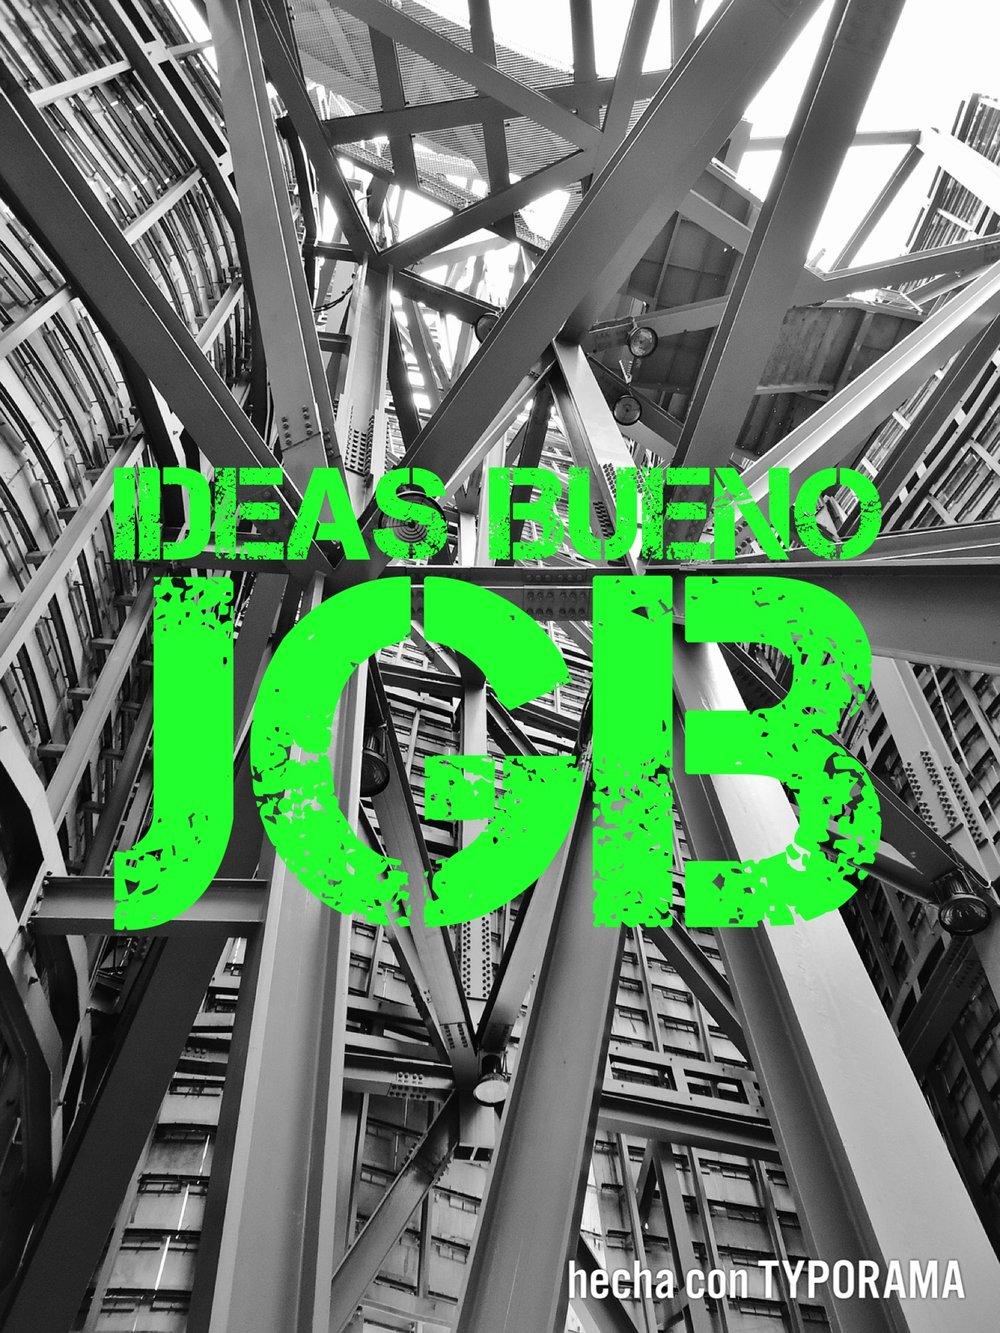 Trabajos en acero - @ideasbuenoJGB www.facebook.com/IdeasBuenoJGB